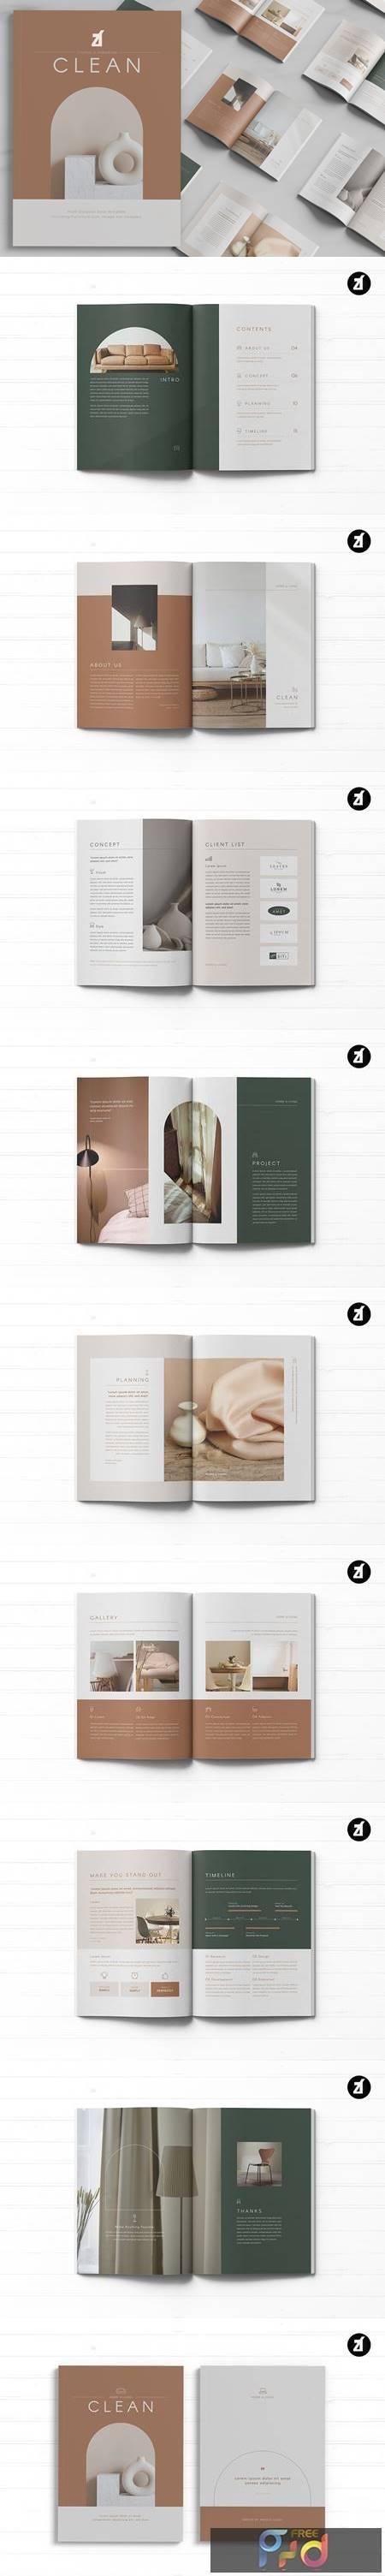 Clean magazine multi-purpose book 5241581 1